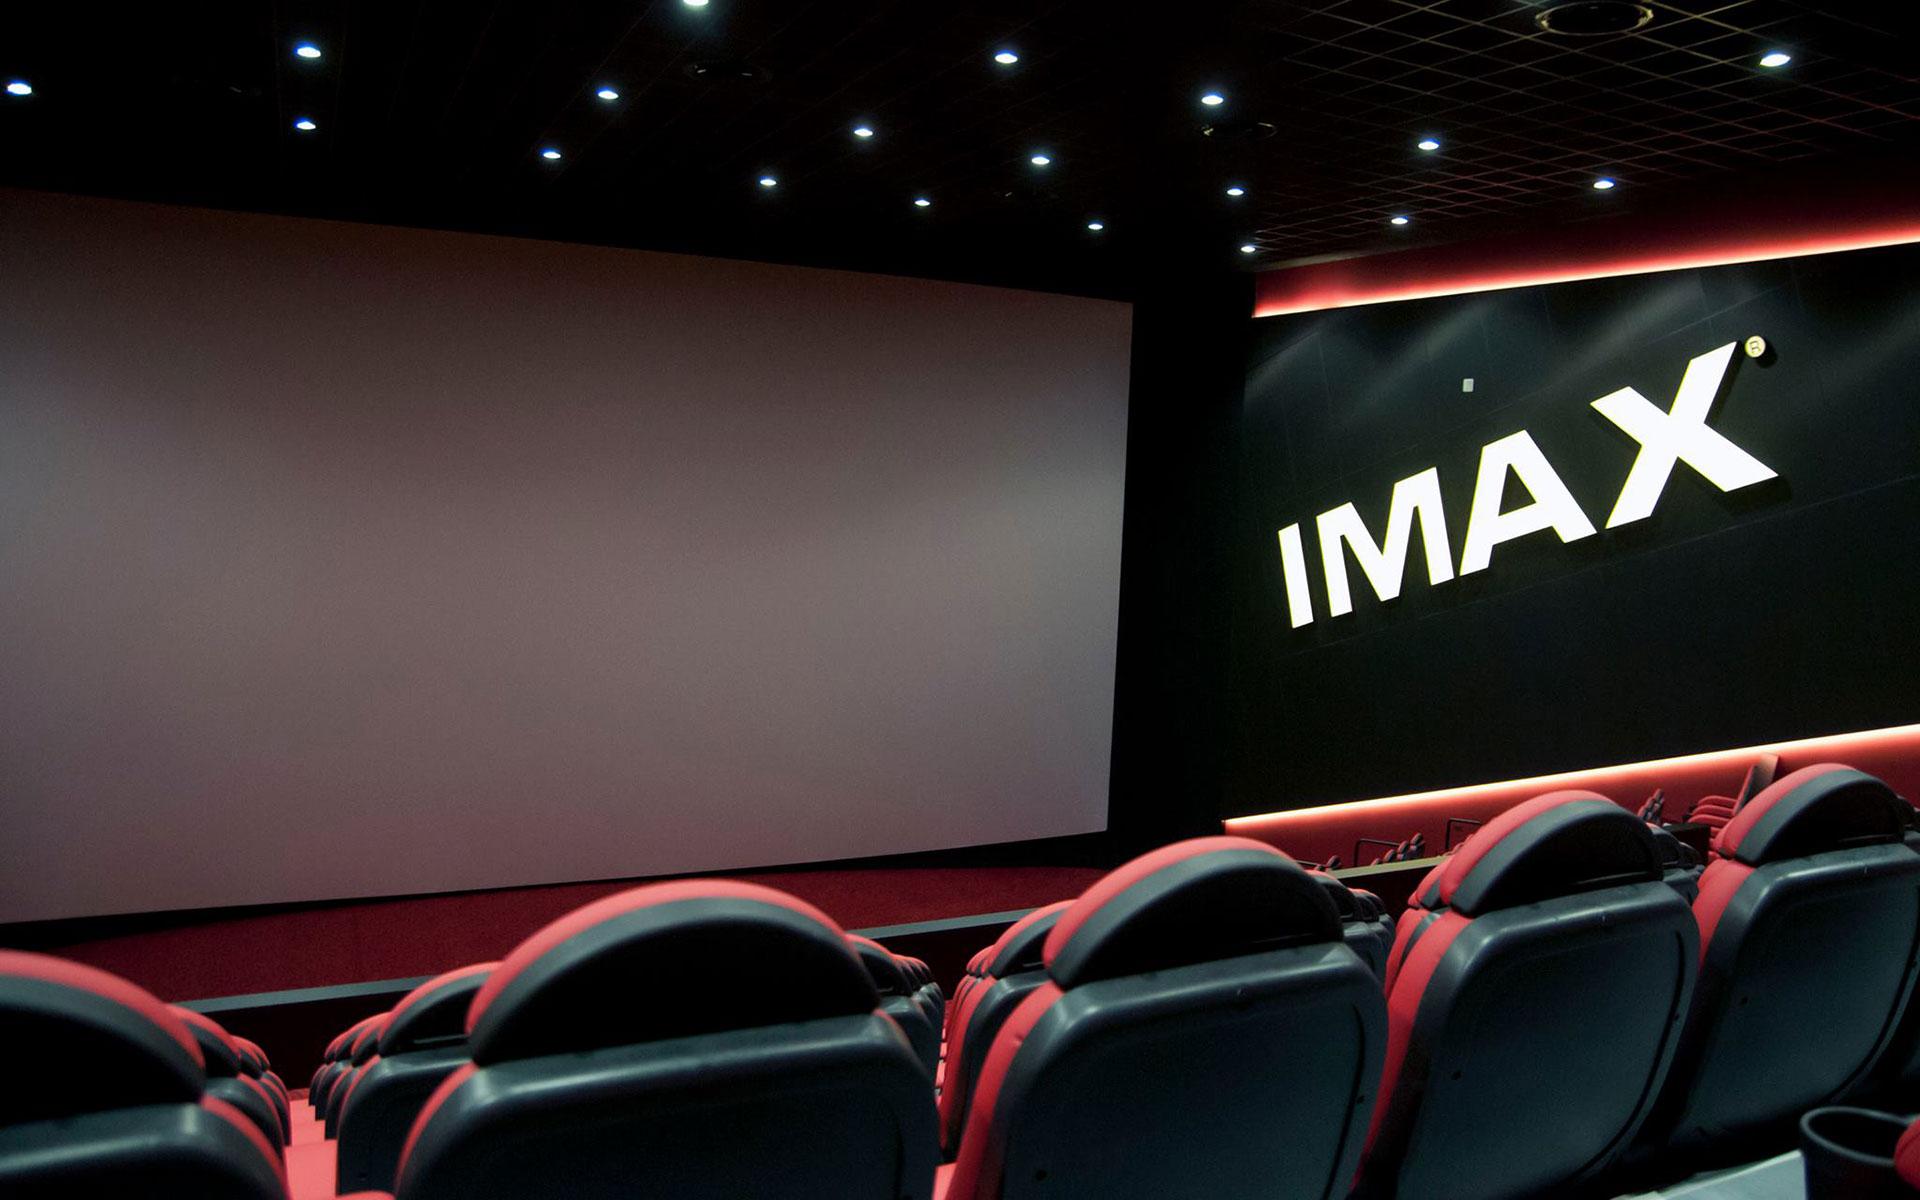 muffe Randers cinema kino